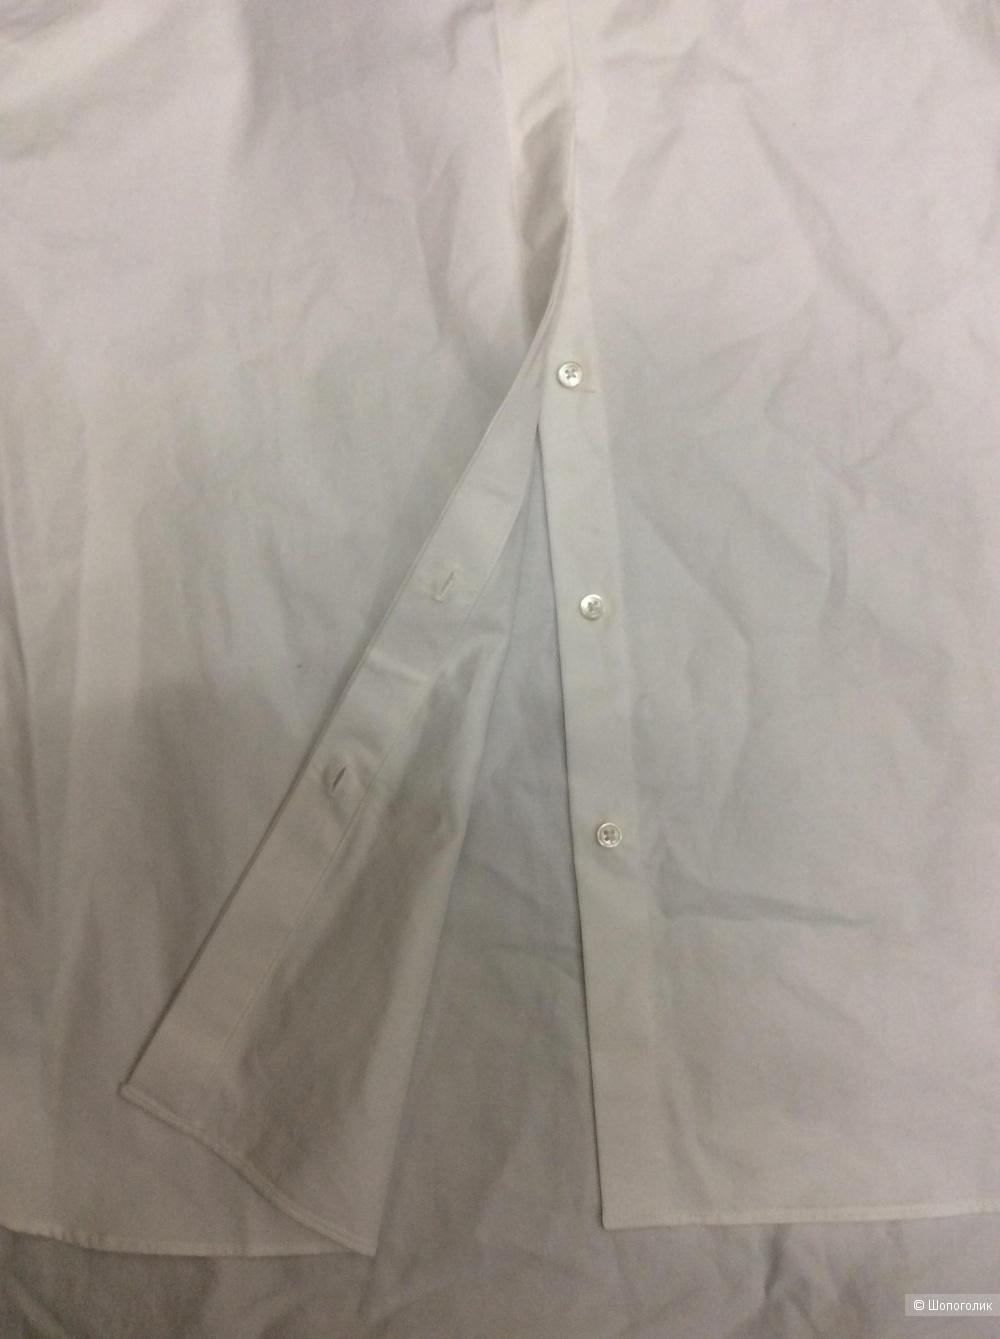 Блузка Massino Dutti 44 размер